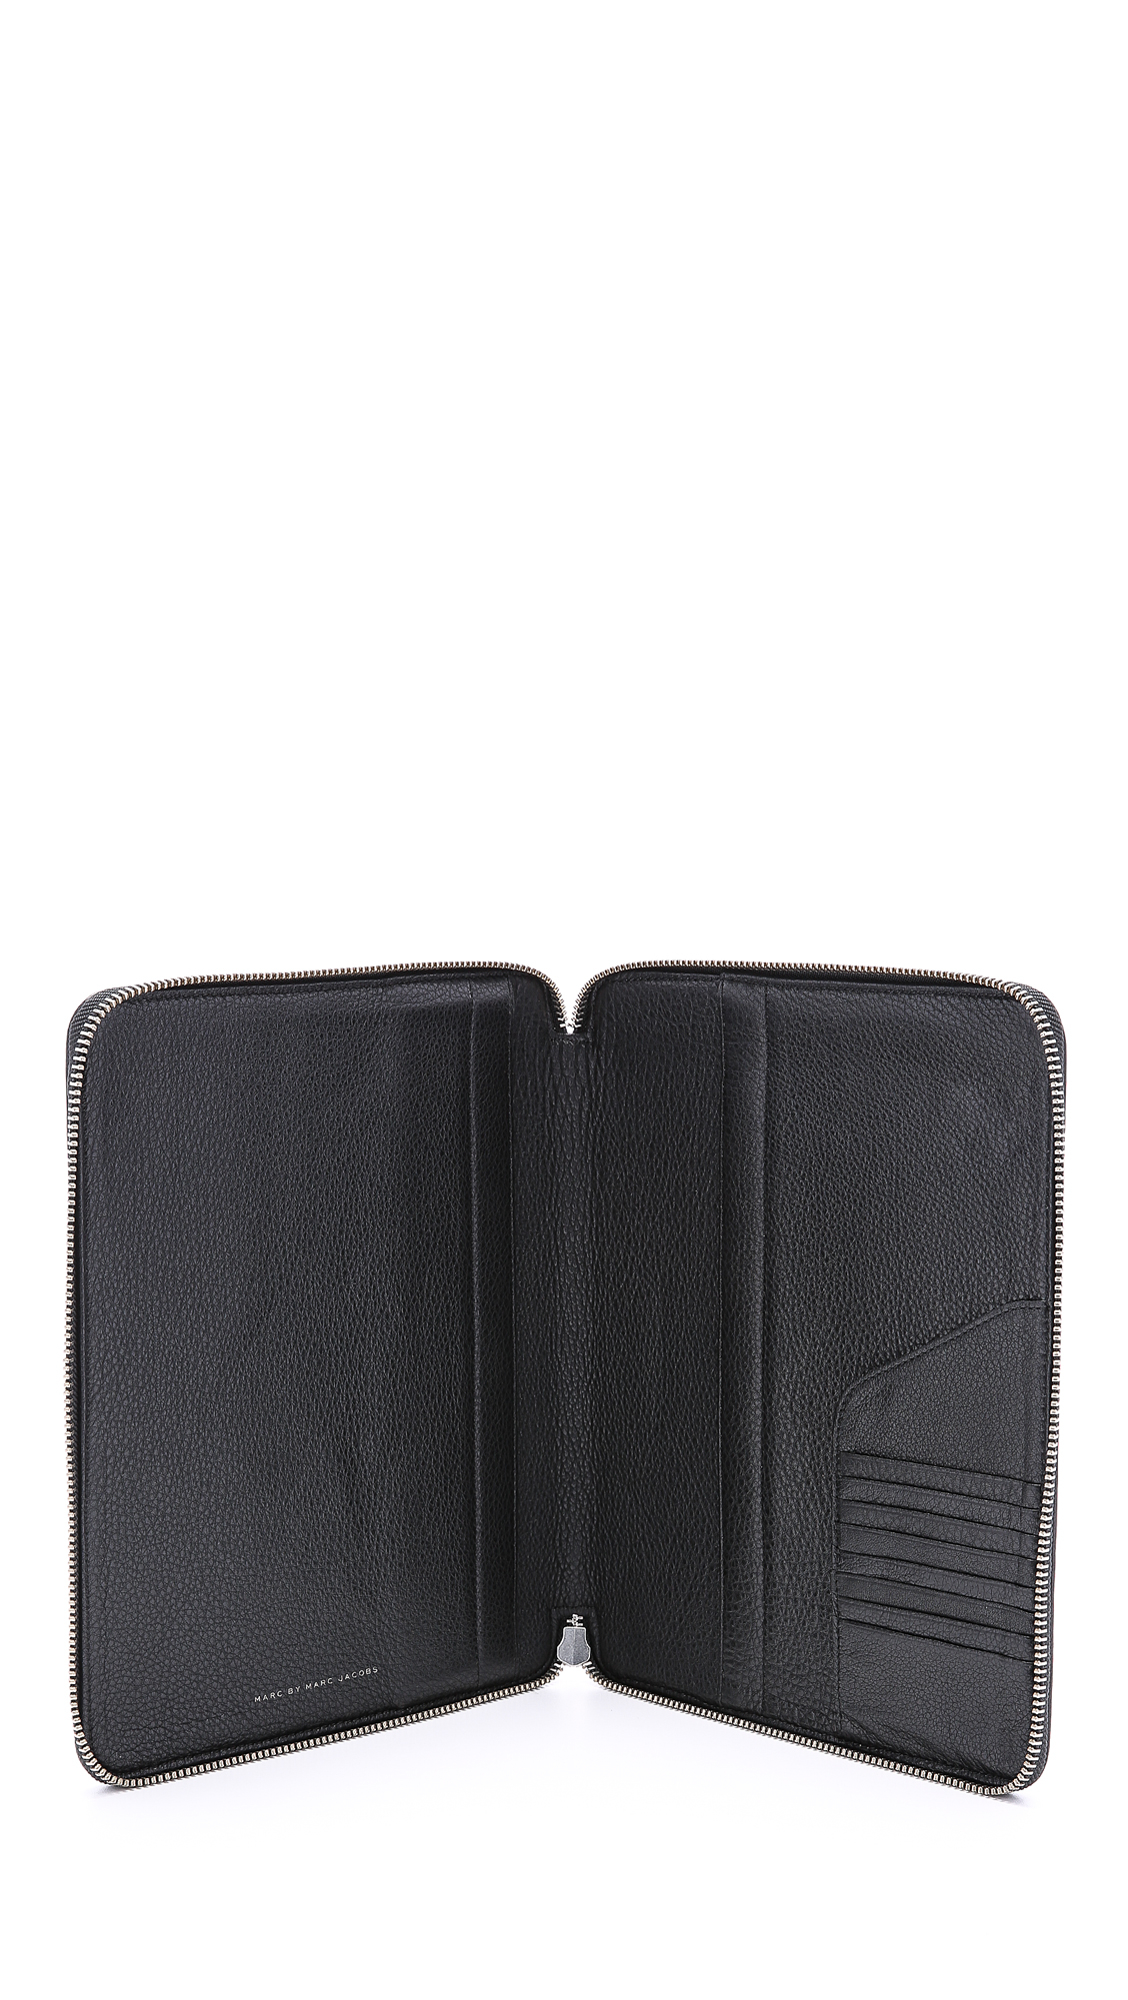 Awesome Black Leather Resume Portfolio Photos - Resume Ideas ...